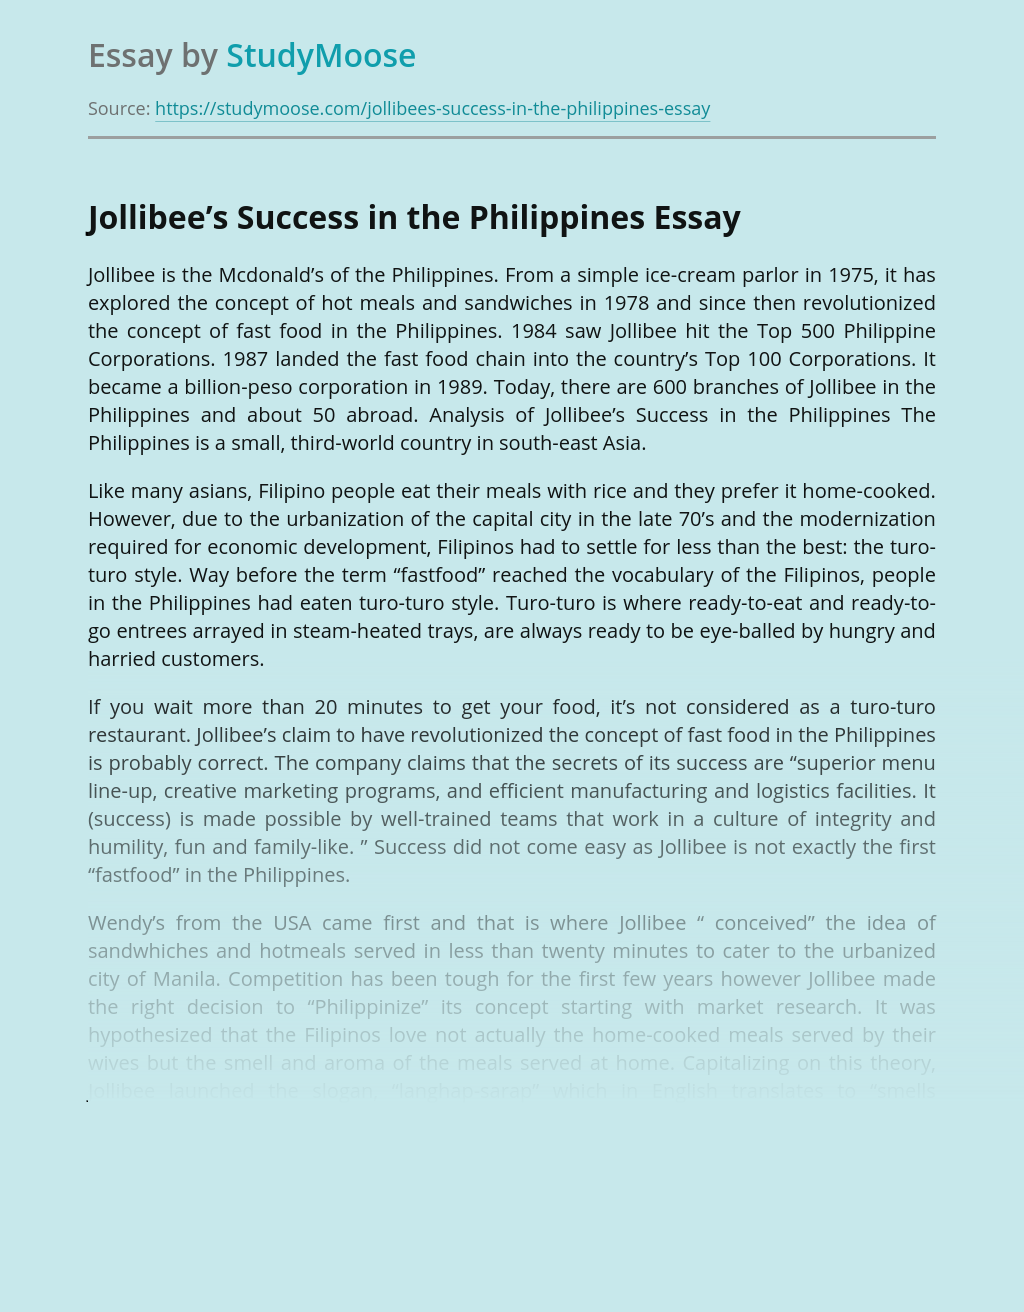 Jollibee's Success in the Philippines